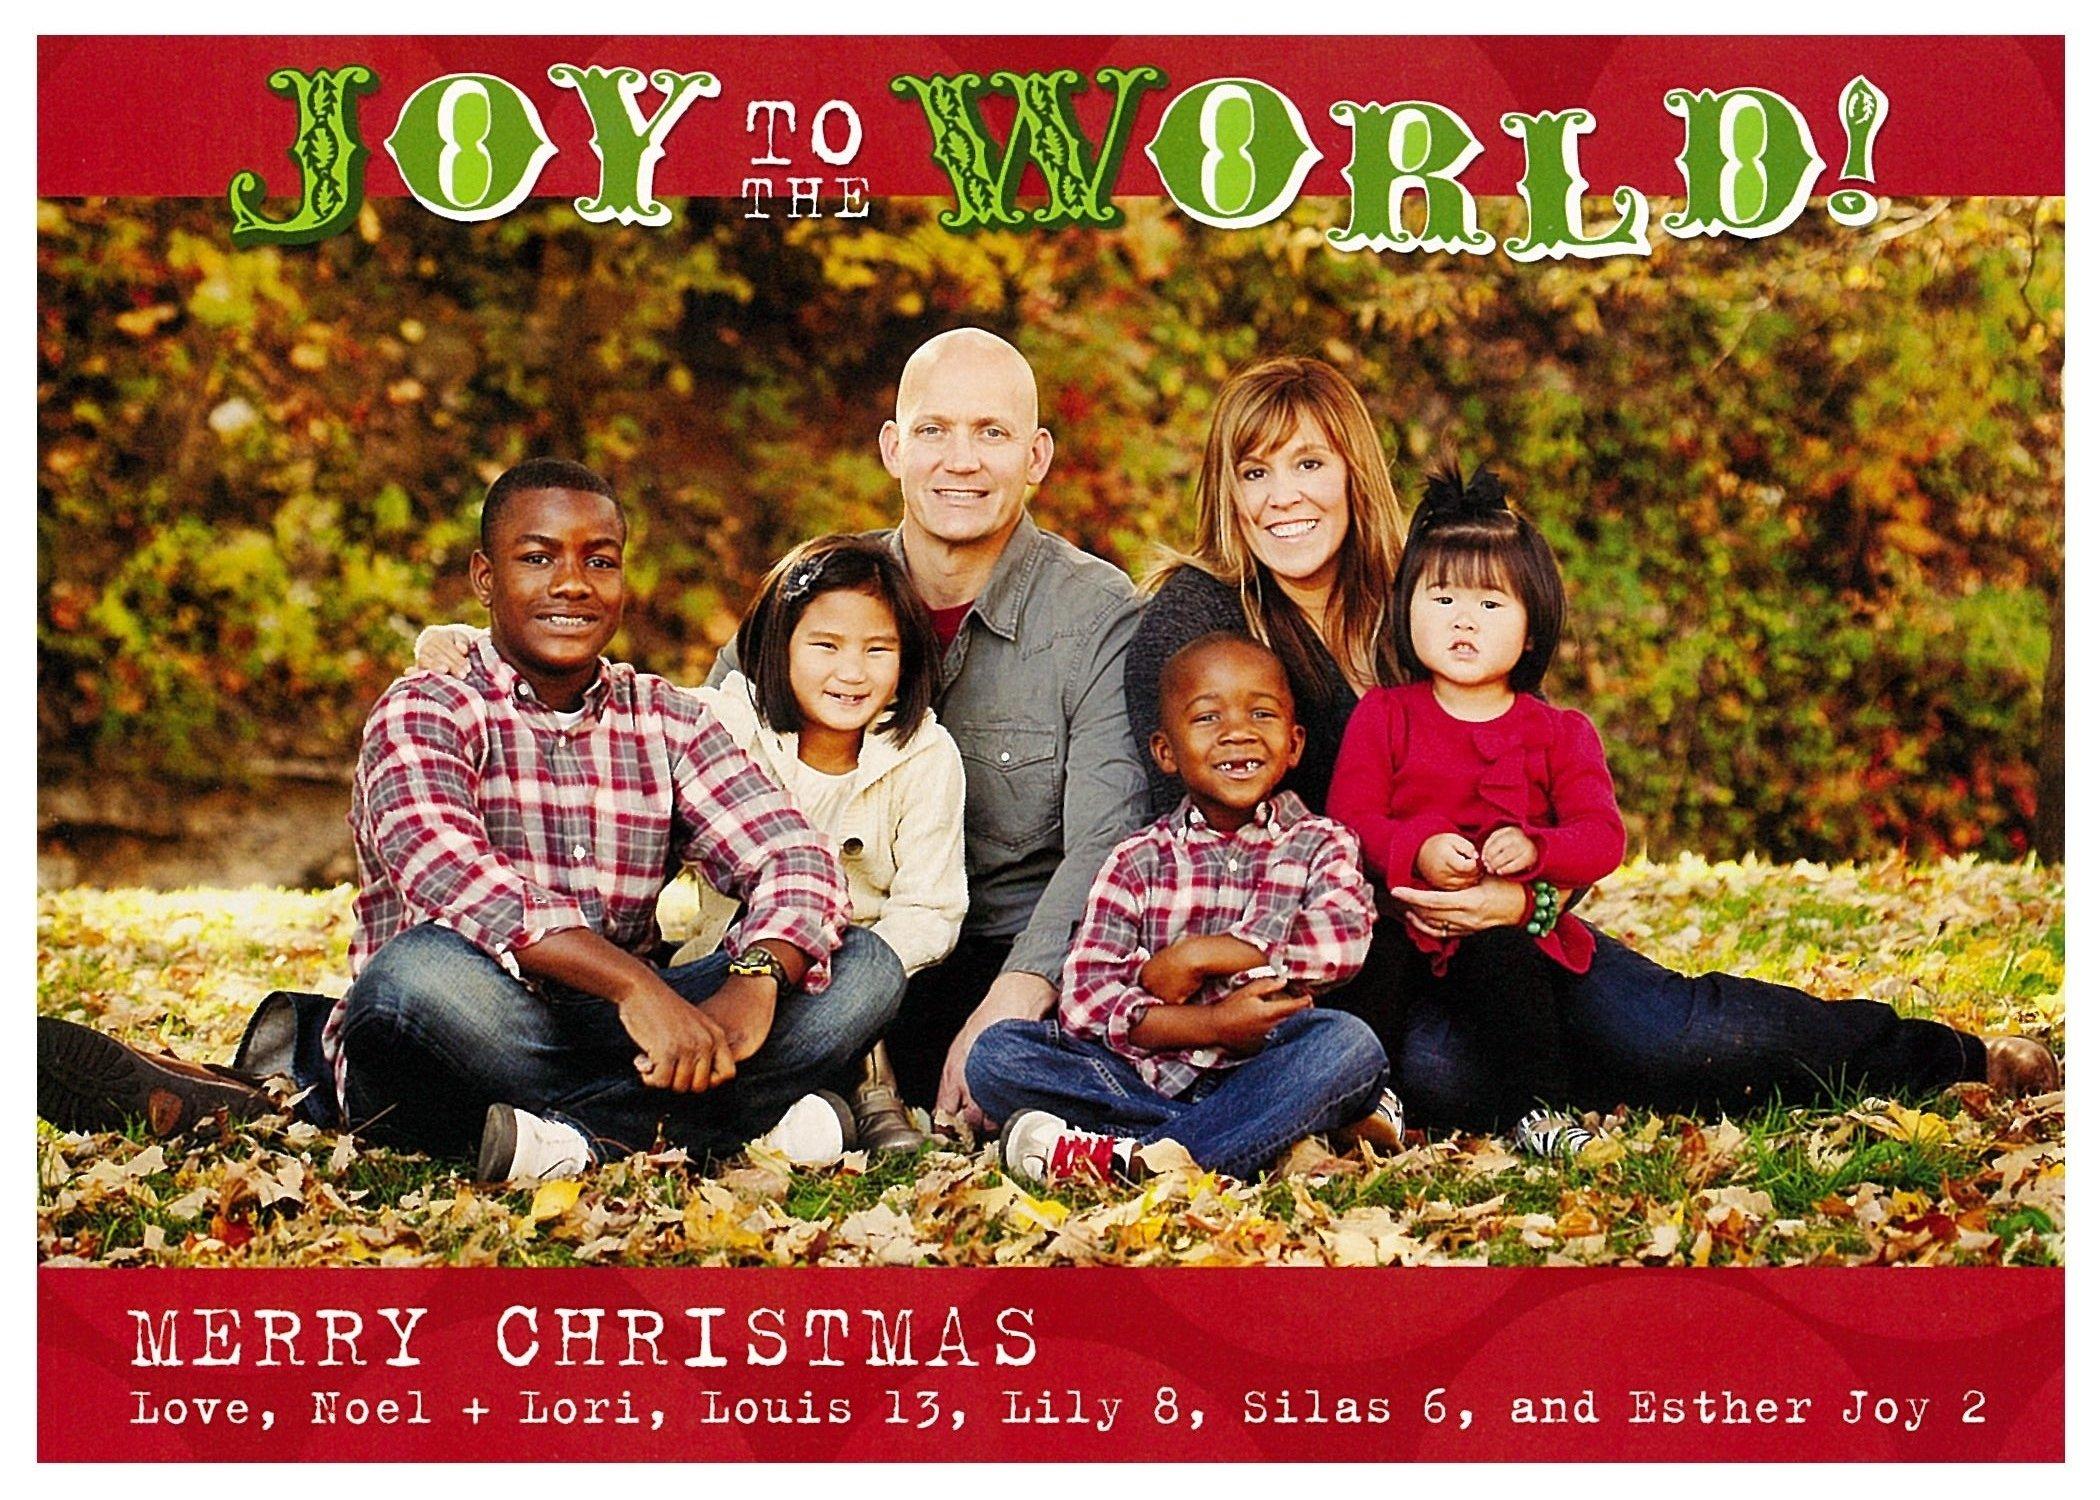 10 Beautiful Best Christmas Card Photo Ideas christmas cards families outreach home art decor 55978 1